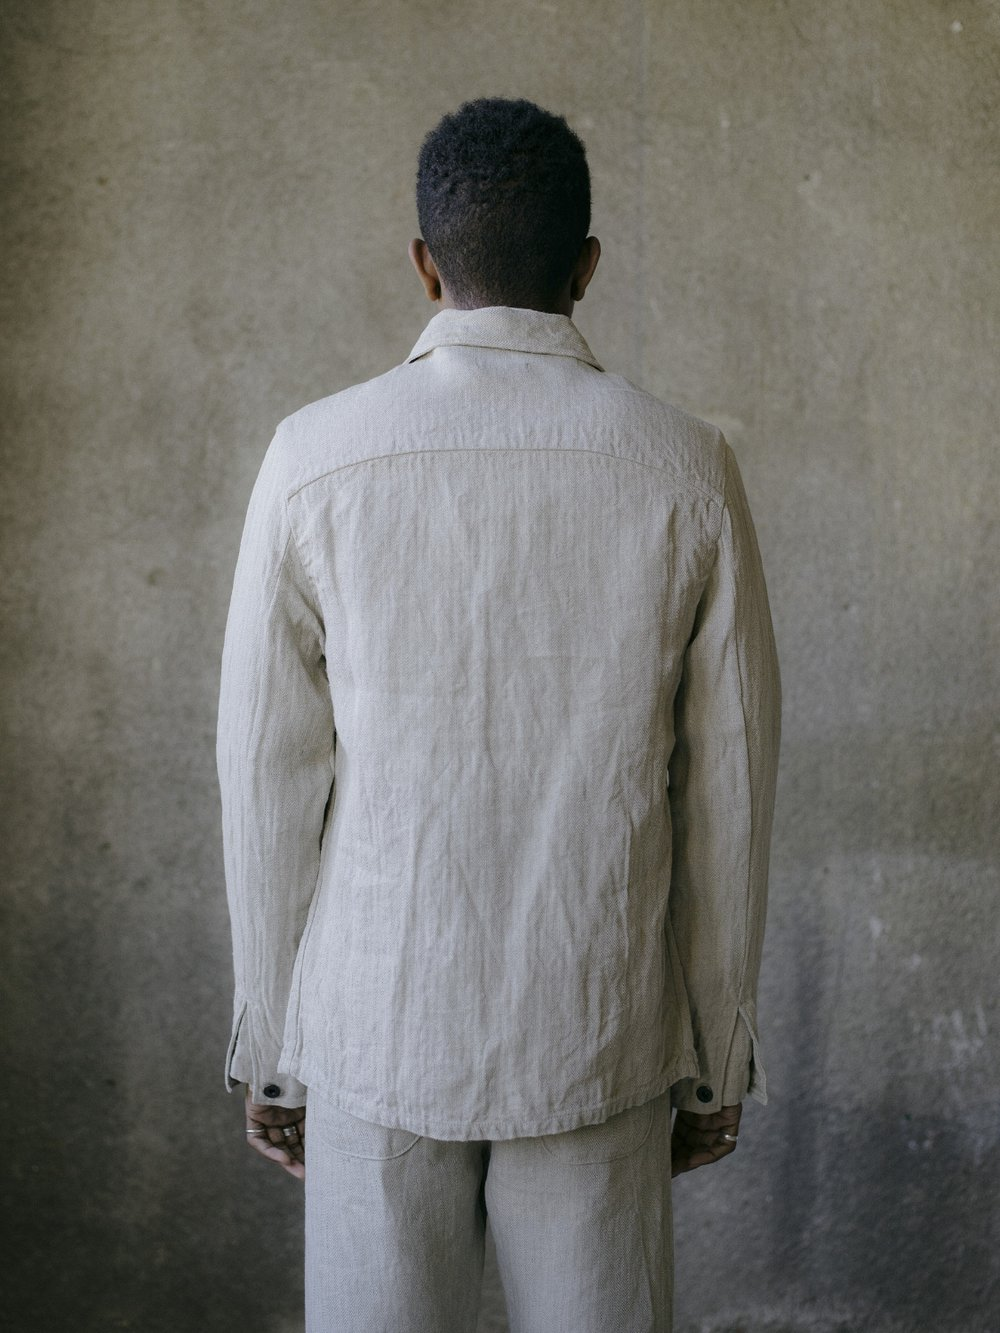 evan-kinori-three-pocket-jacket-natural-linen-herringbone-3